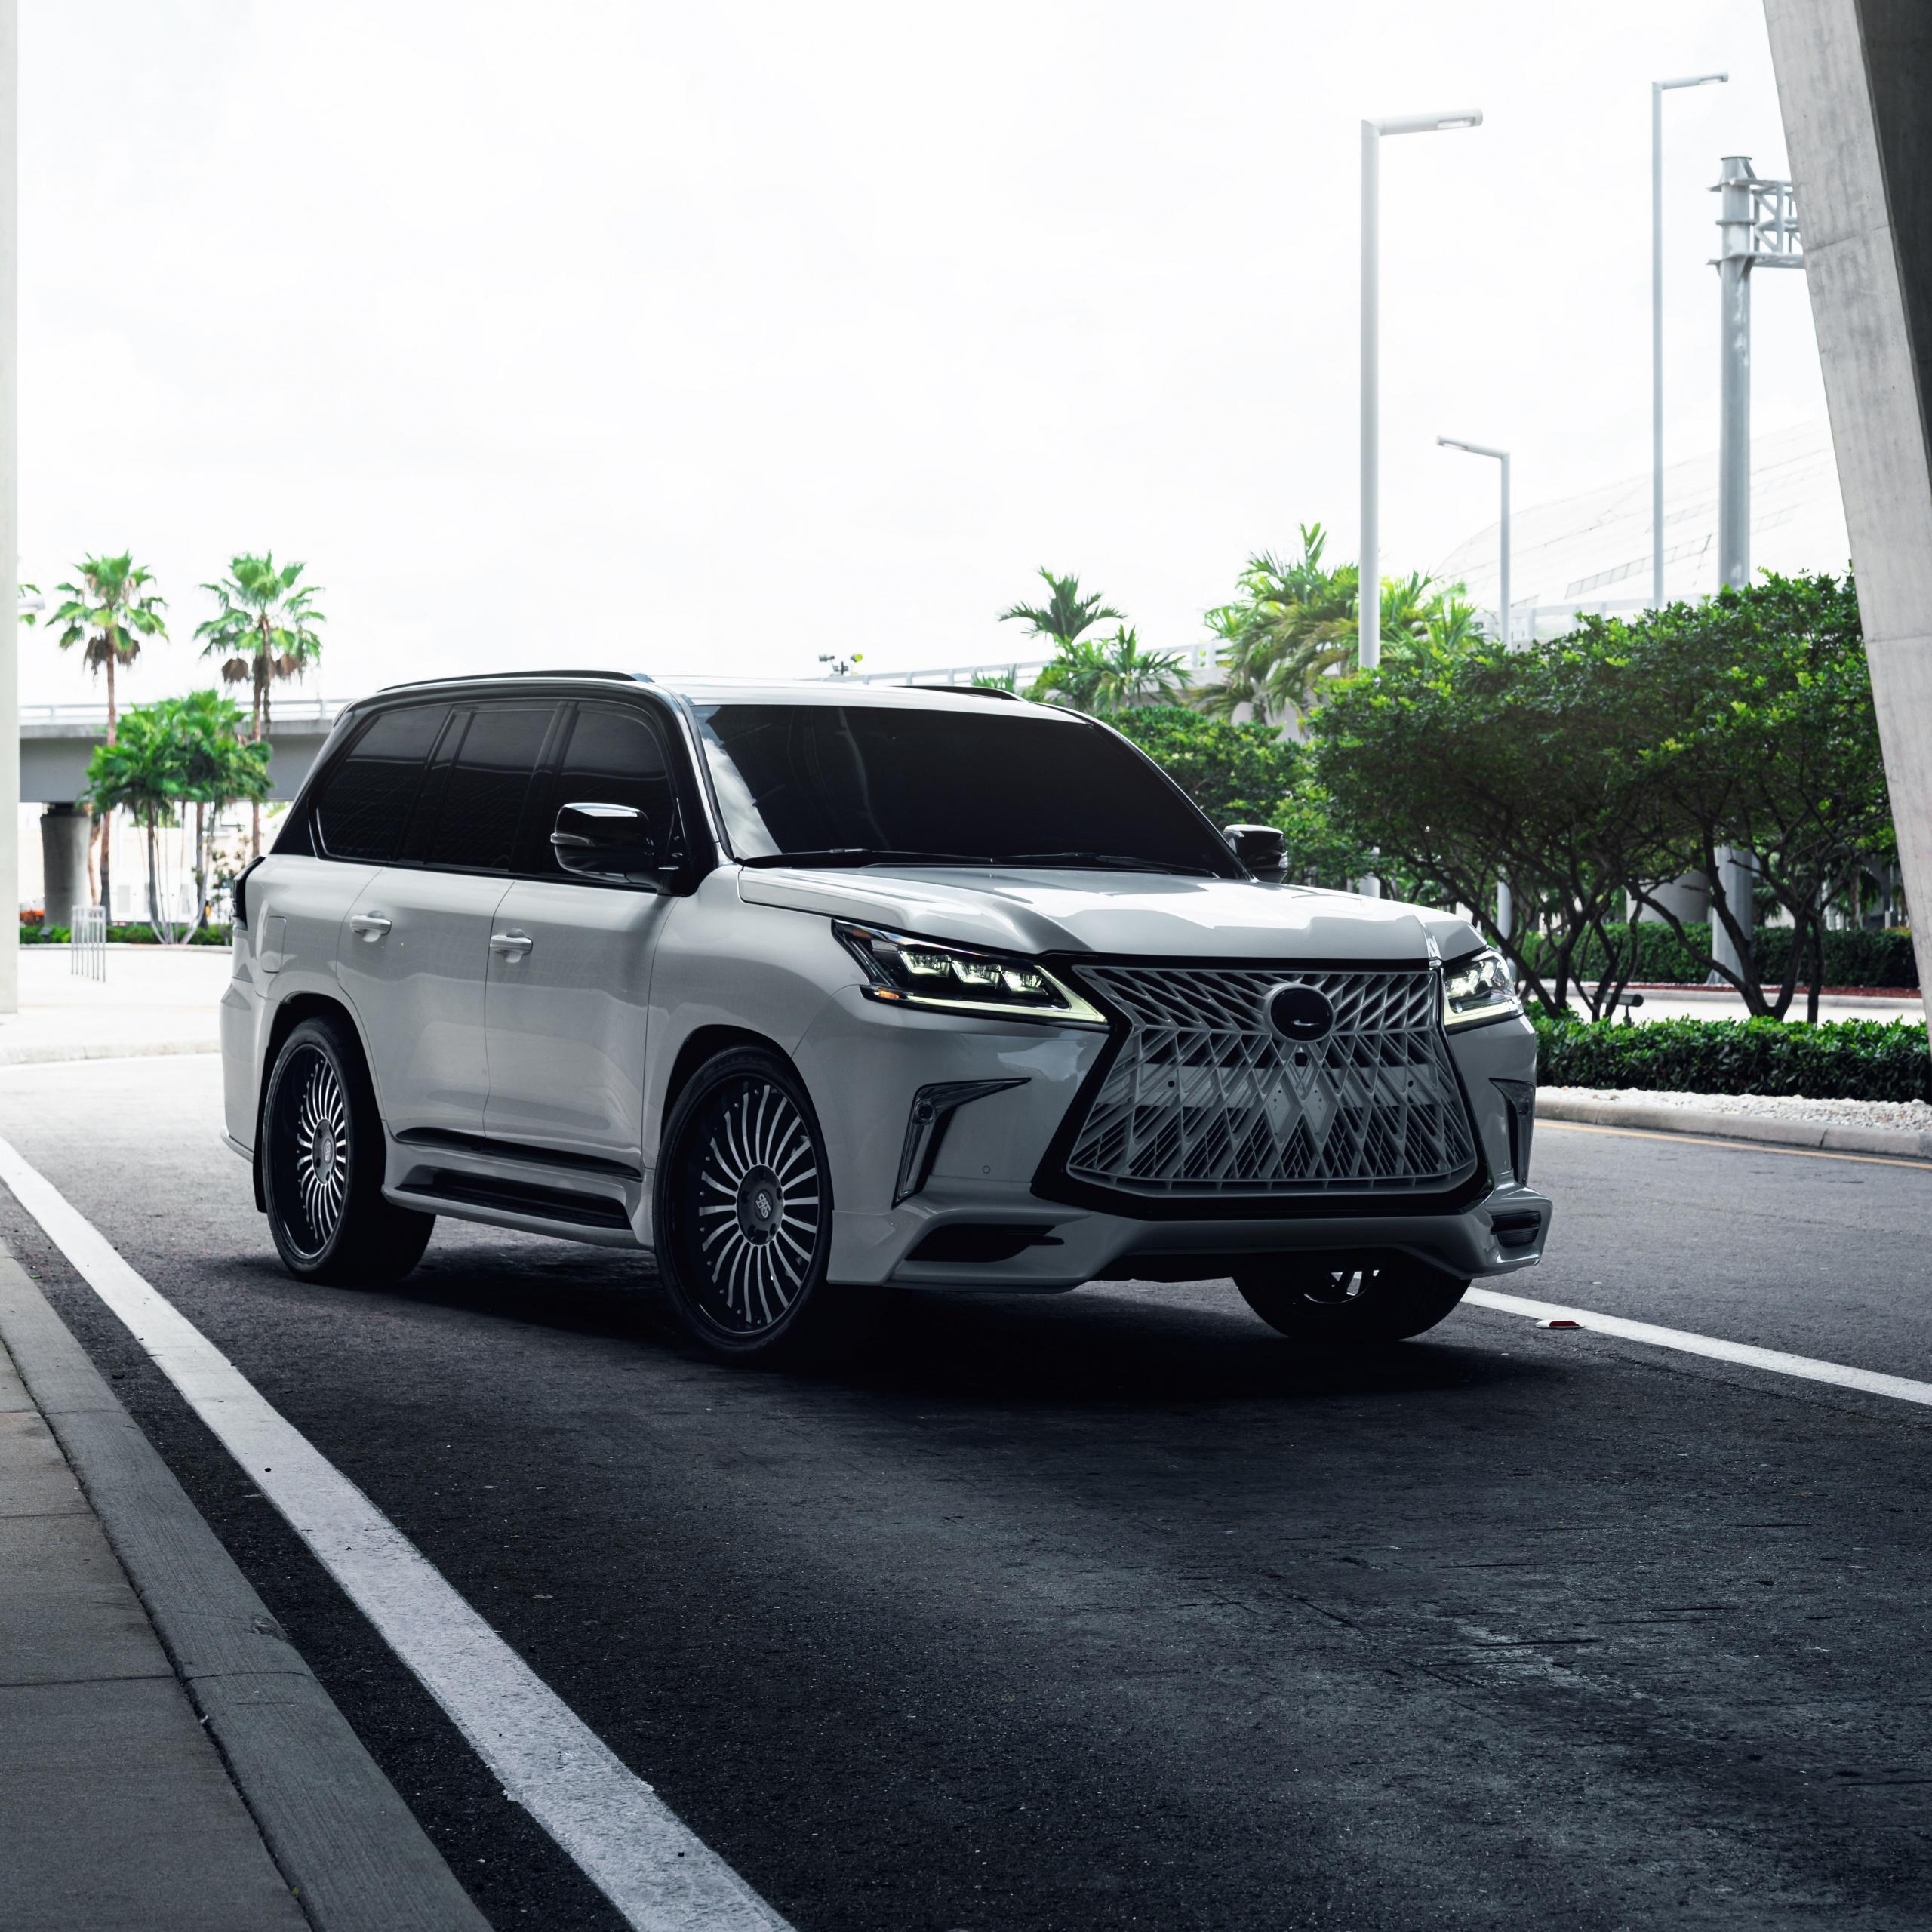 Lexus LX 570 4K Wallpaper, Luxury SUV, 5K, Cars, #2332